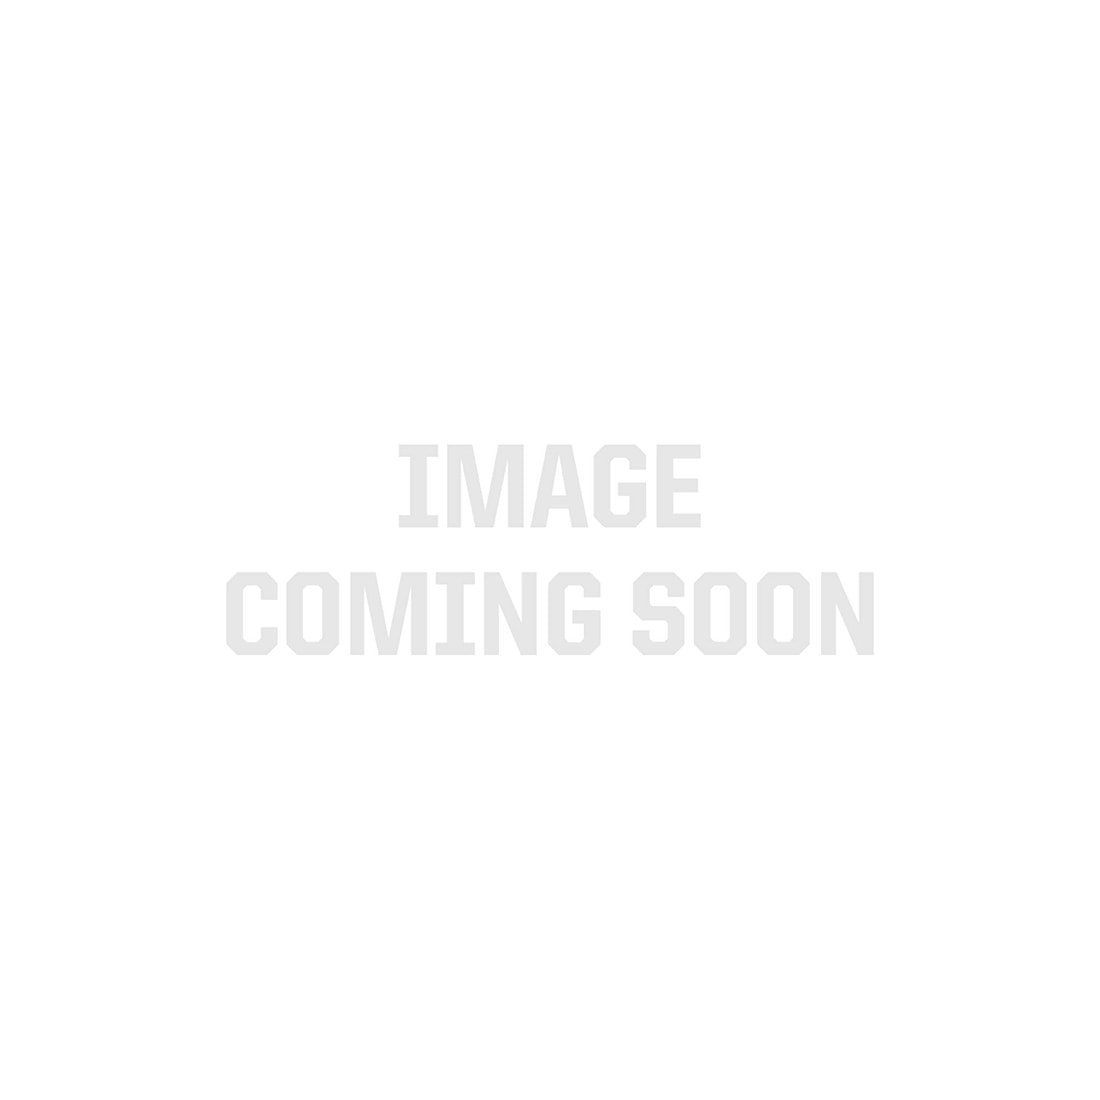 Kichler Design Pro LED 18.9 inch Hardscape Light Flat Mount Bracket (4-Pack)